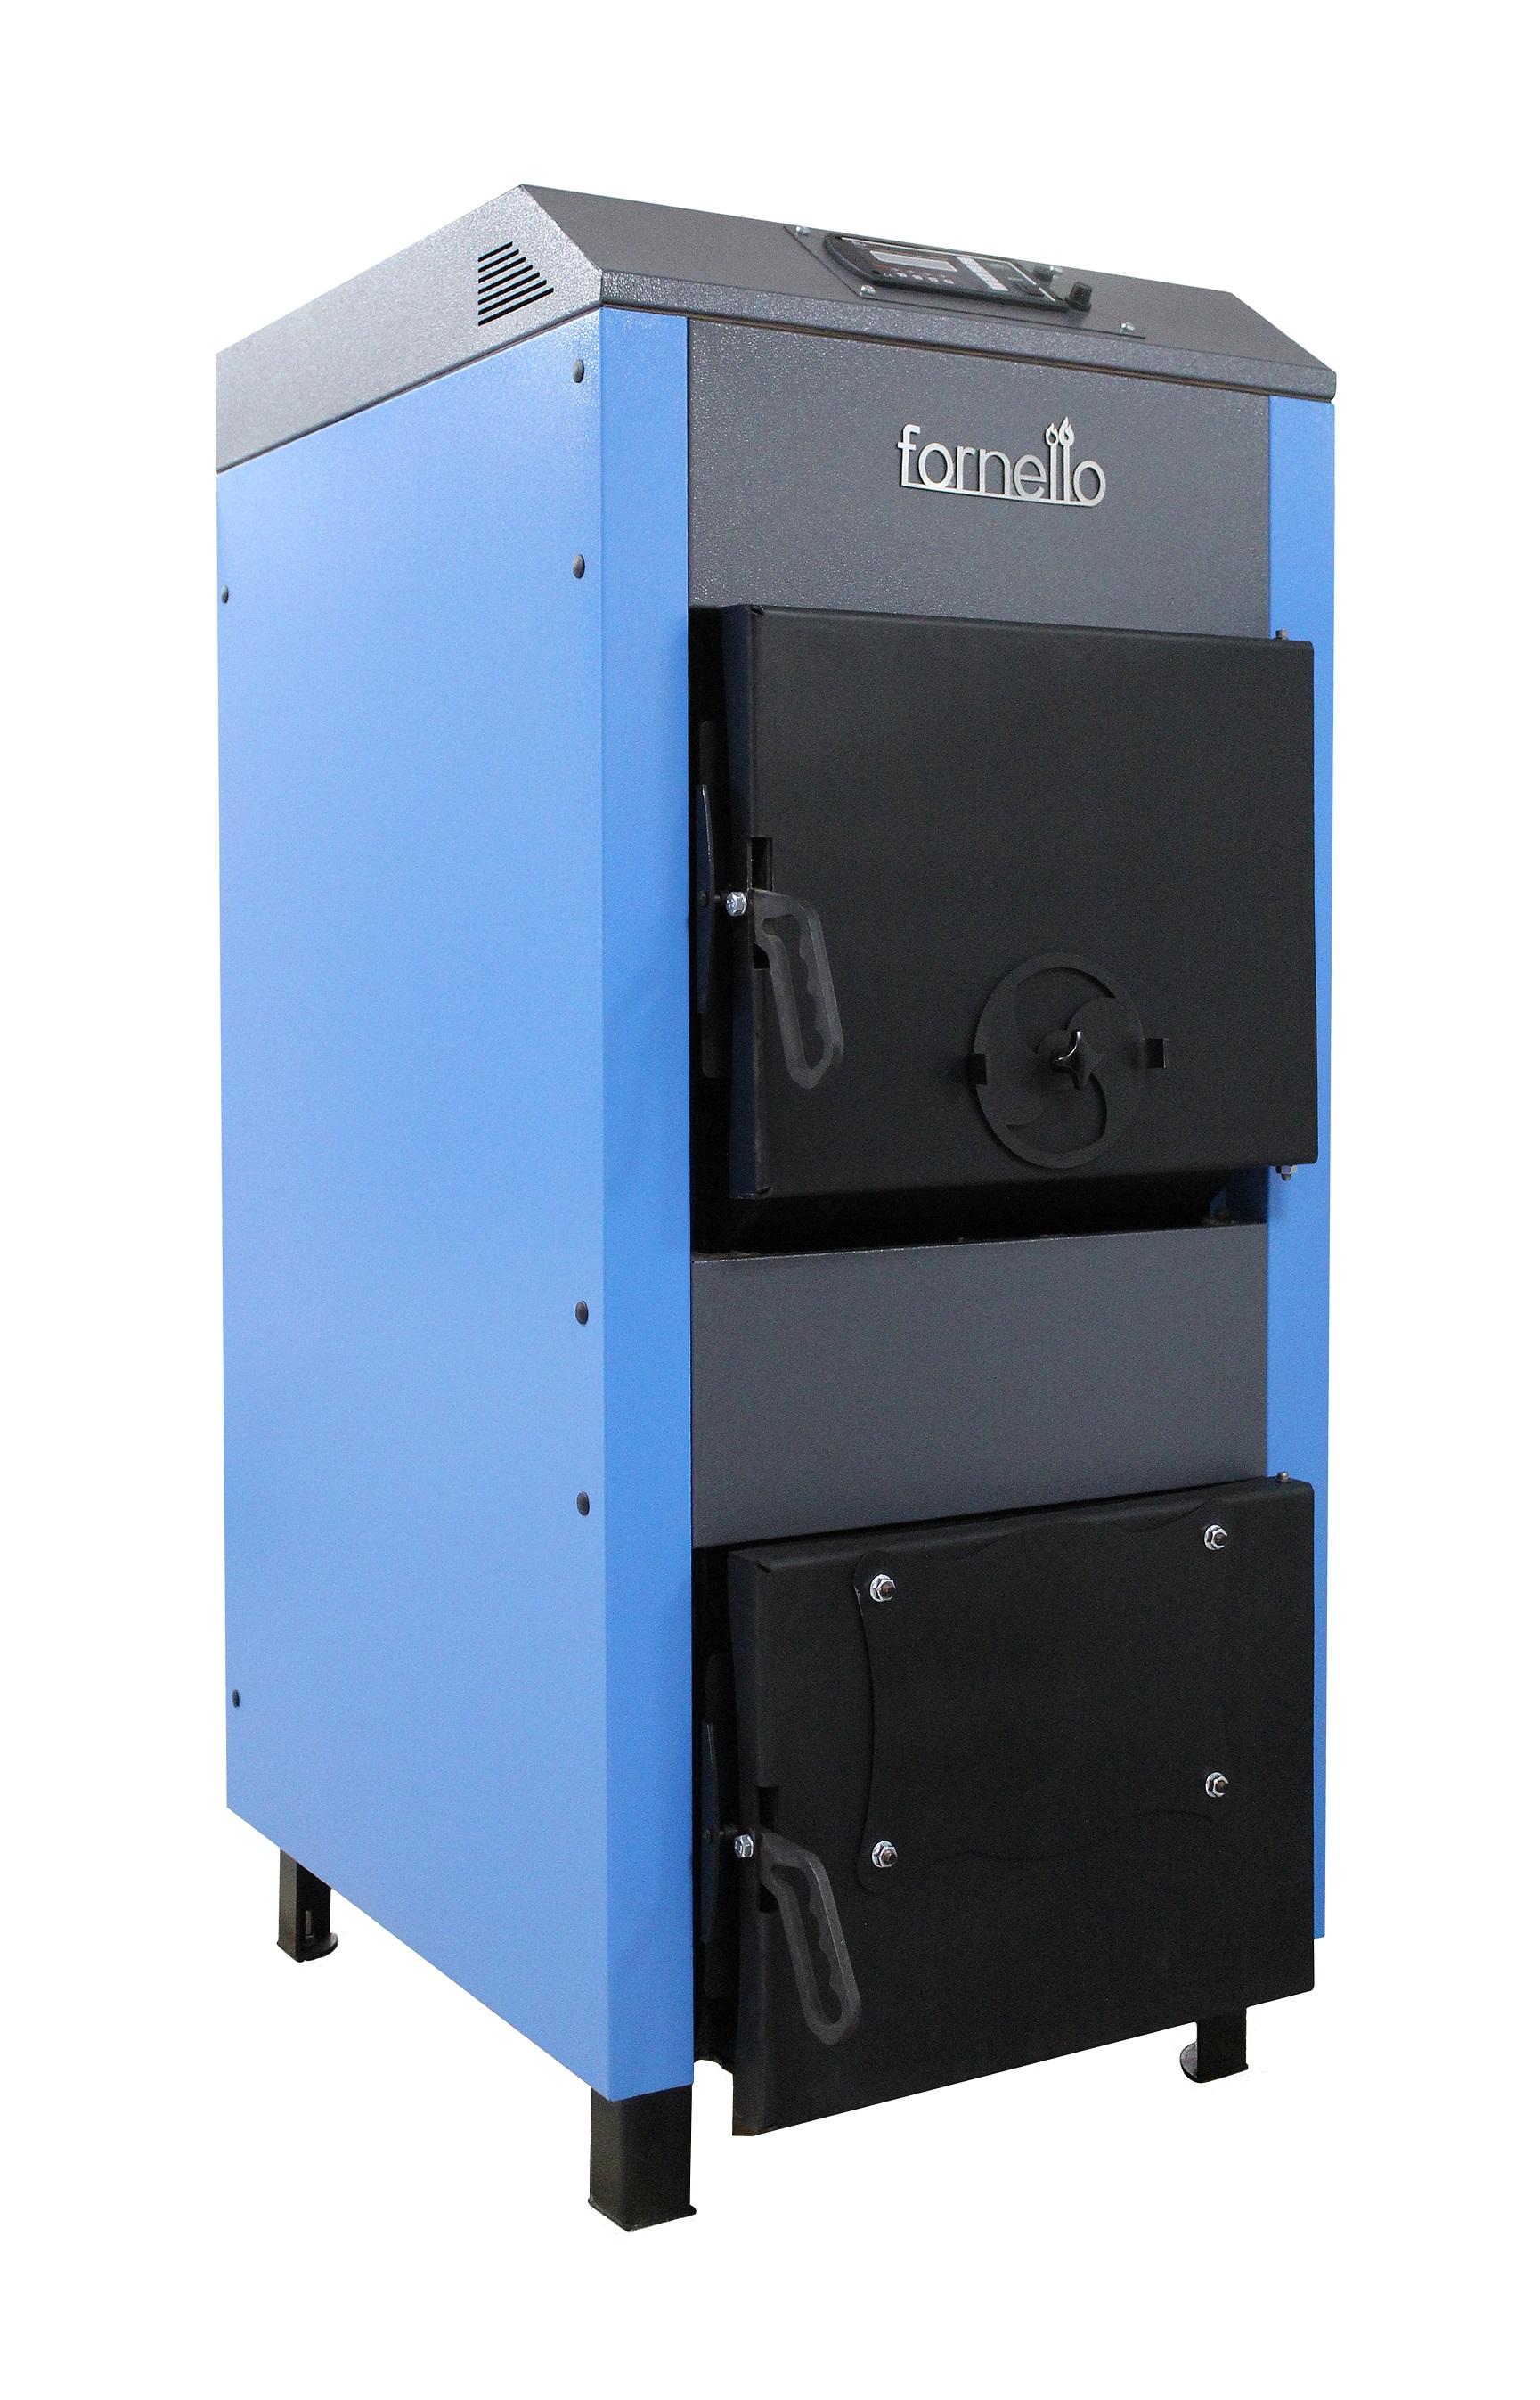 Centrala pe lemne, brichete si carbuni Fornello A 45 kW, cu ventilator si automatizare, serpentina de racire si flansa pentru arzator cu peleti imagine fornello.ro